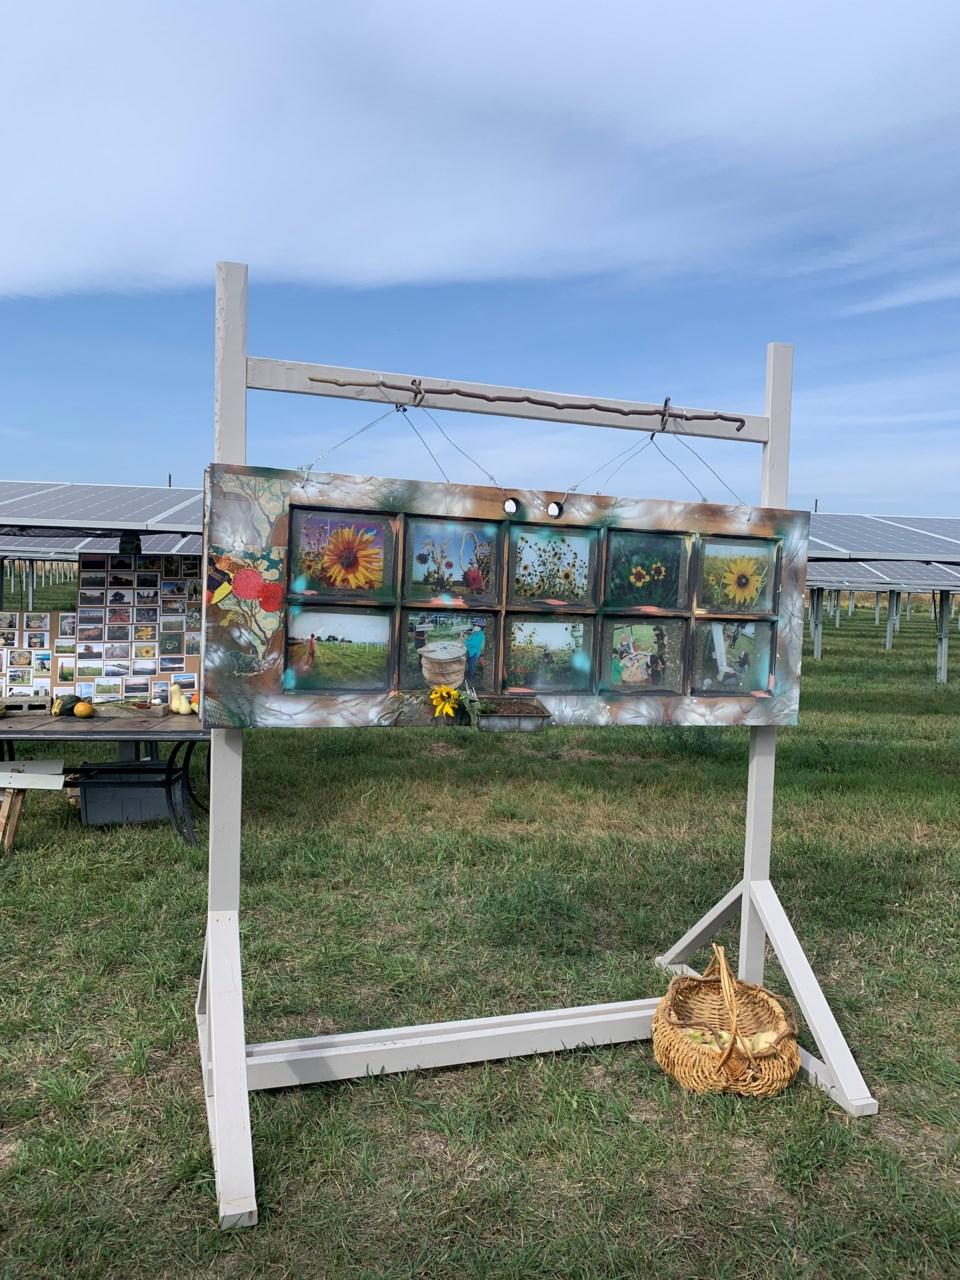 2021_02_20_LL_jacks_solar_garden_artist_residency1